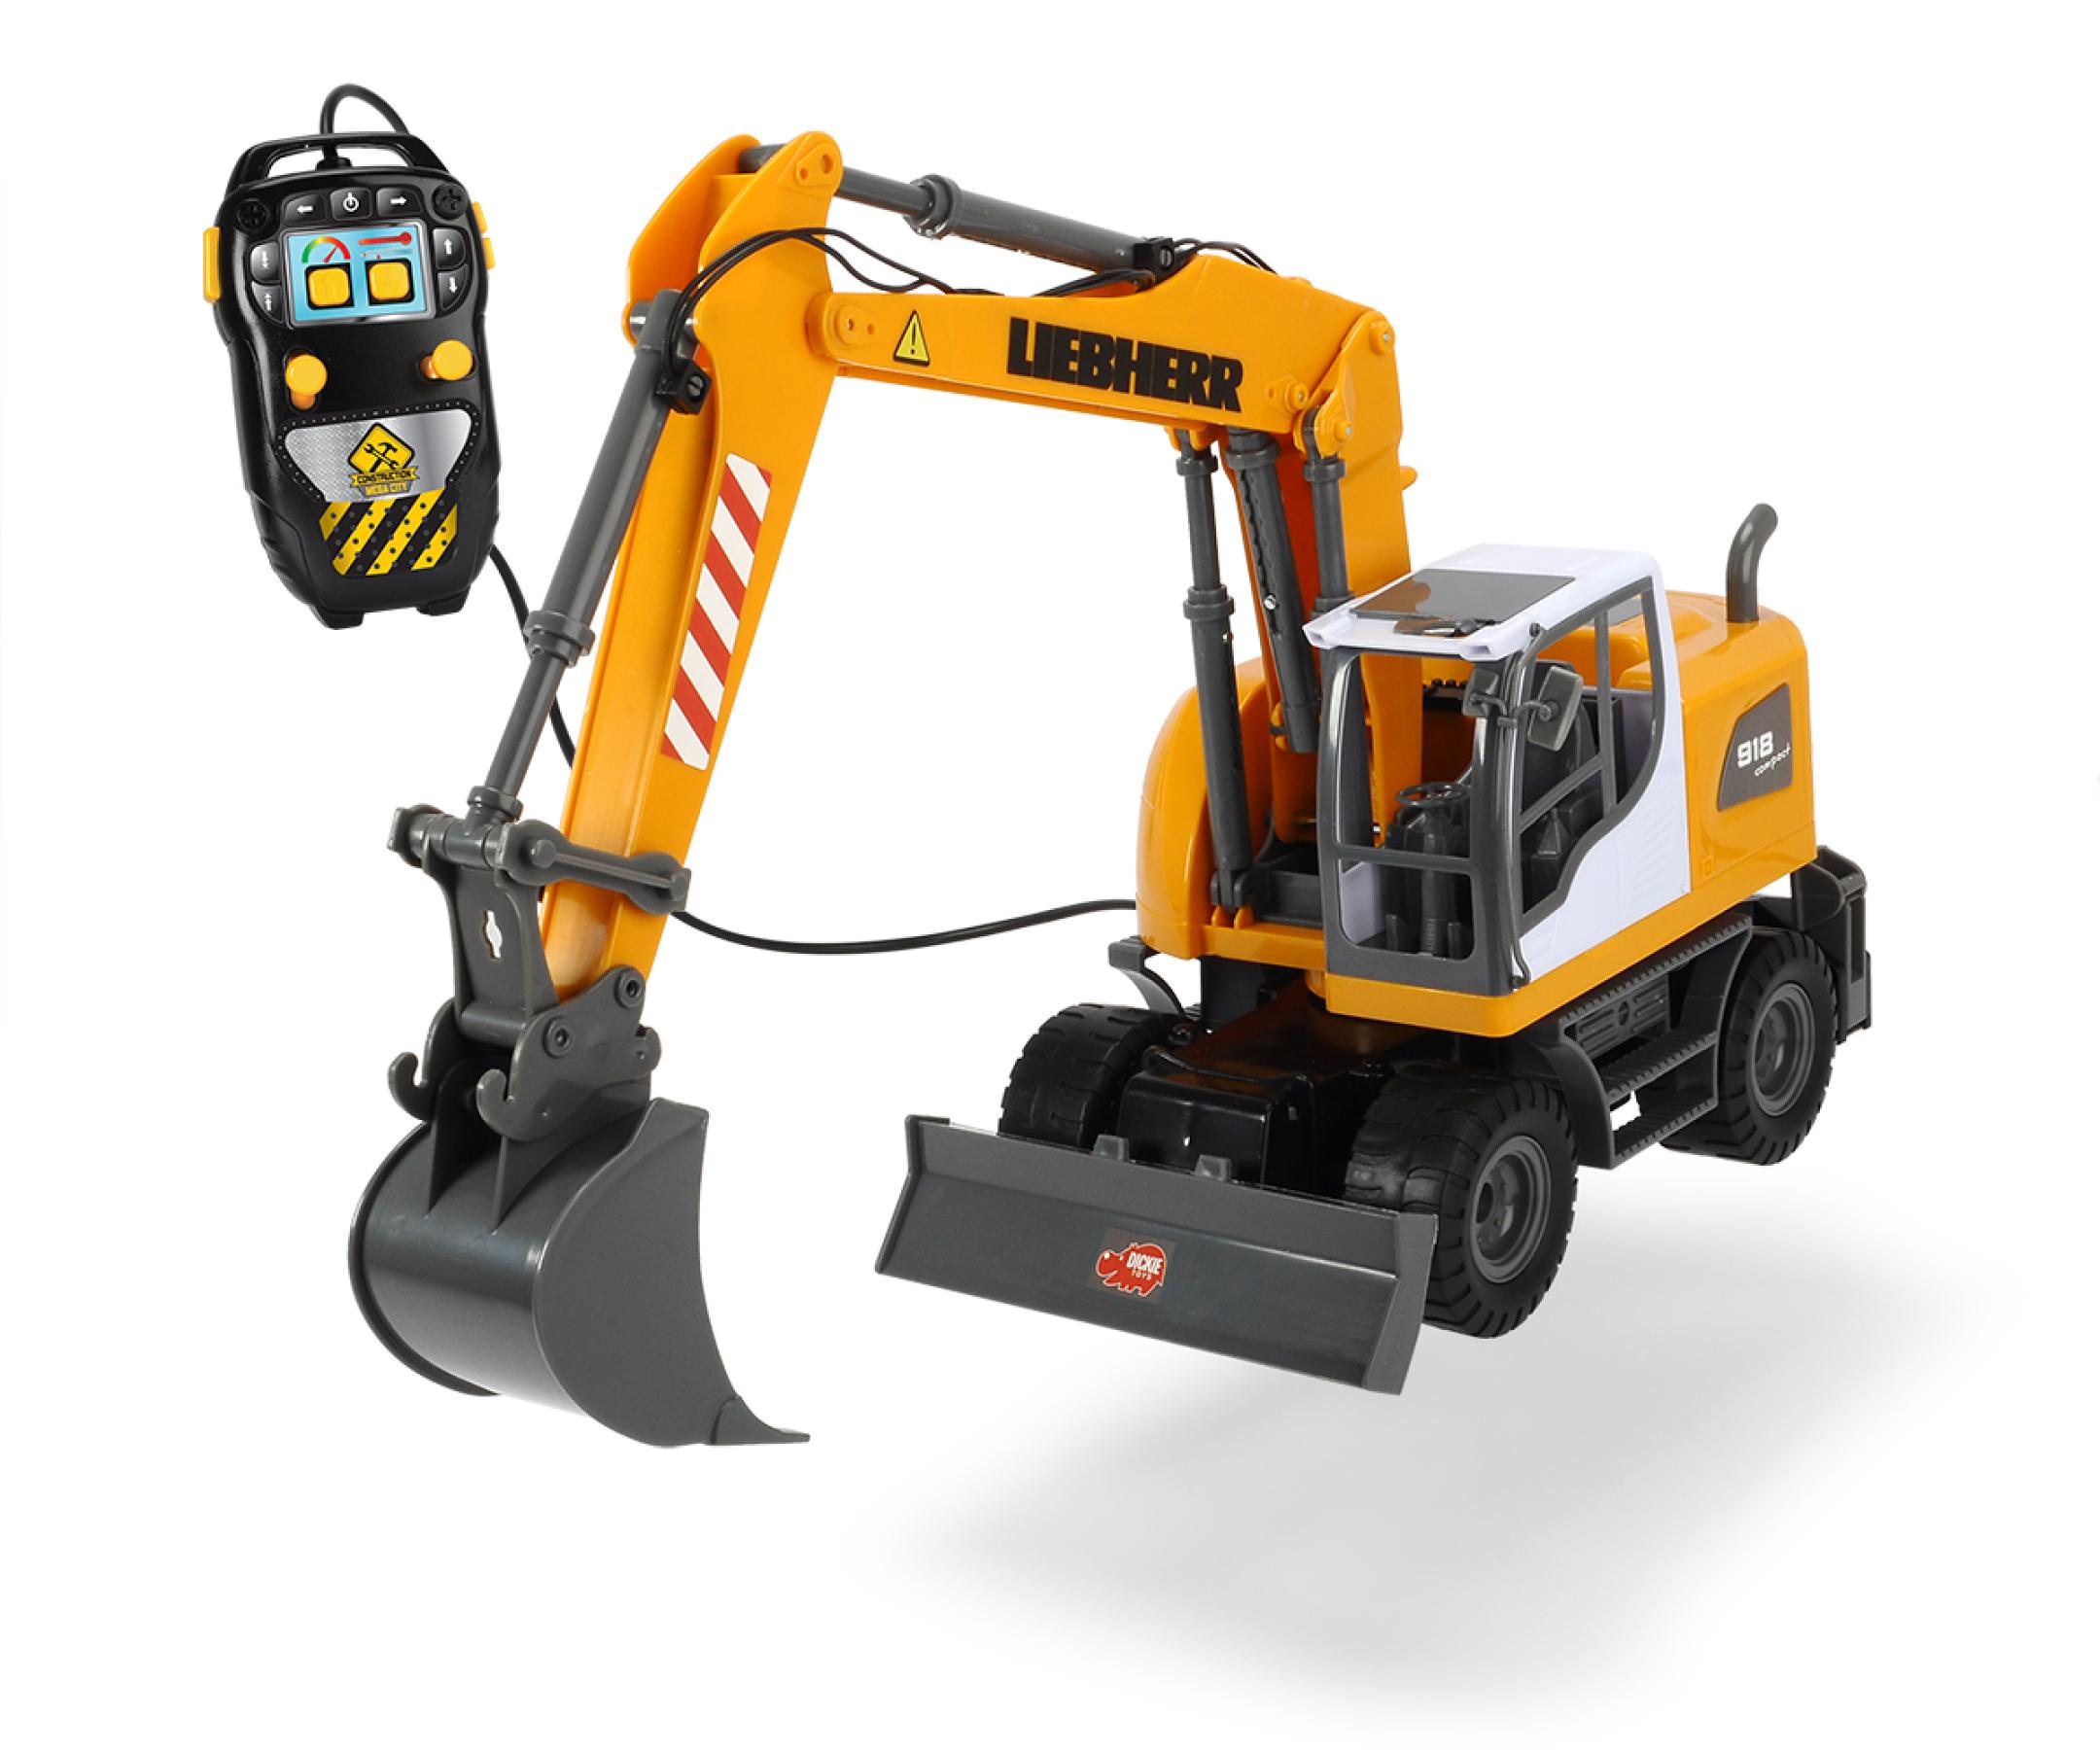 dickie 203728000 liebherr excavator, kinderspielzeug | kinderspiele